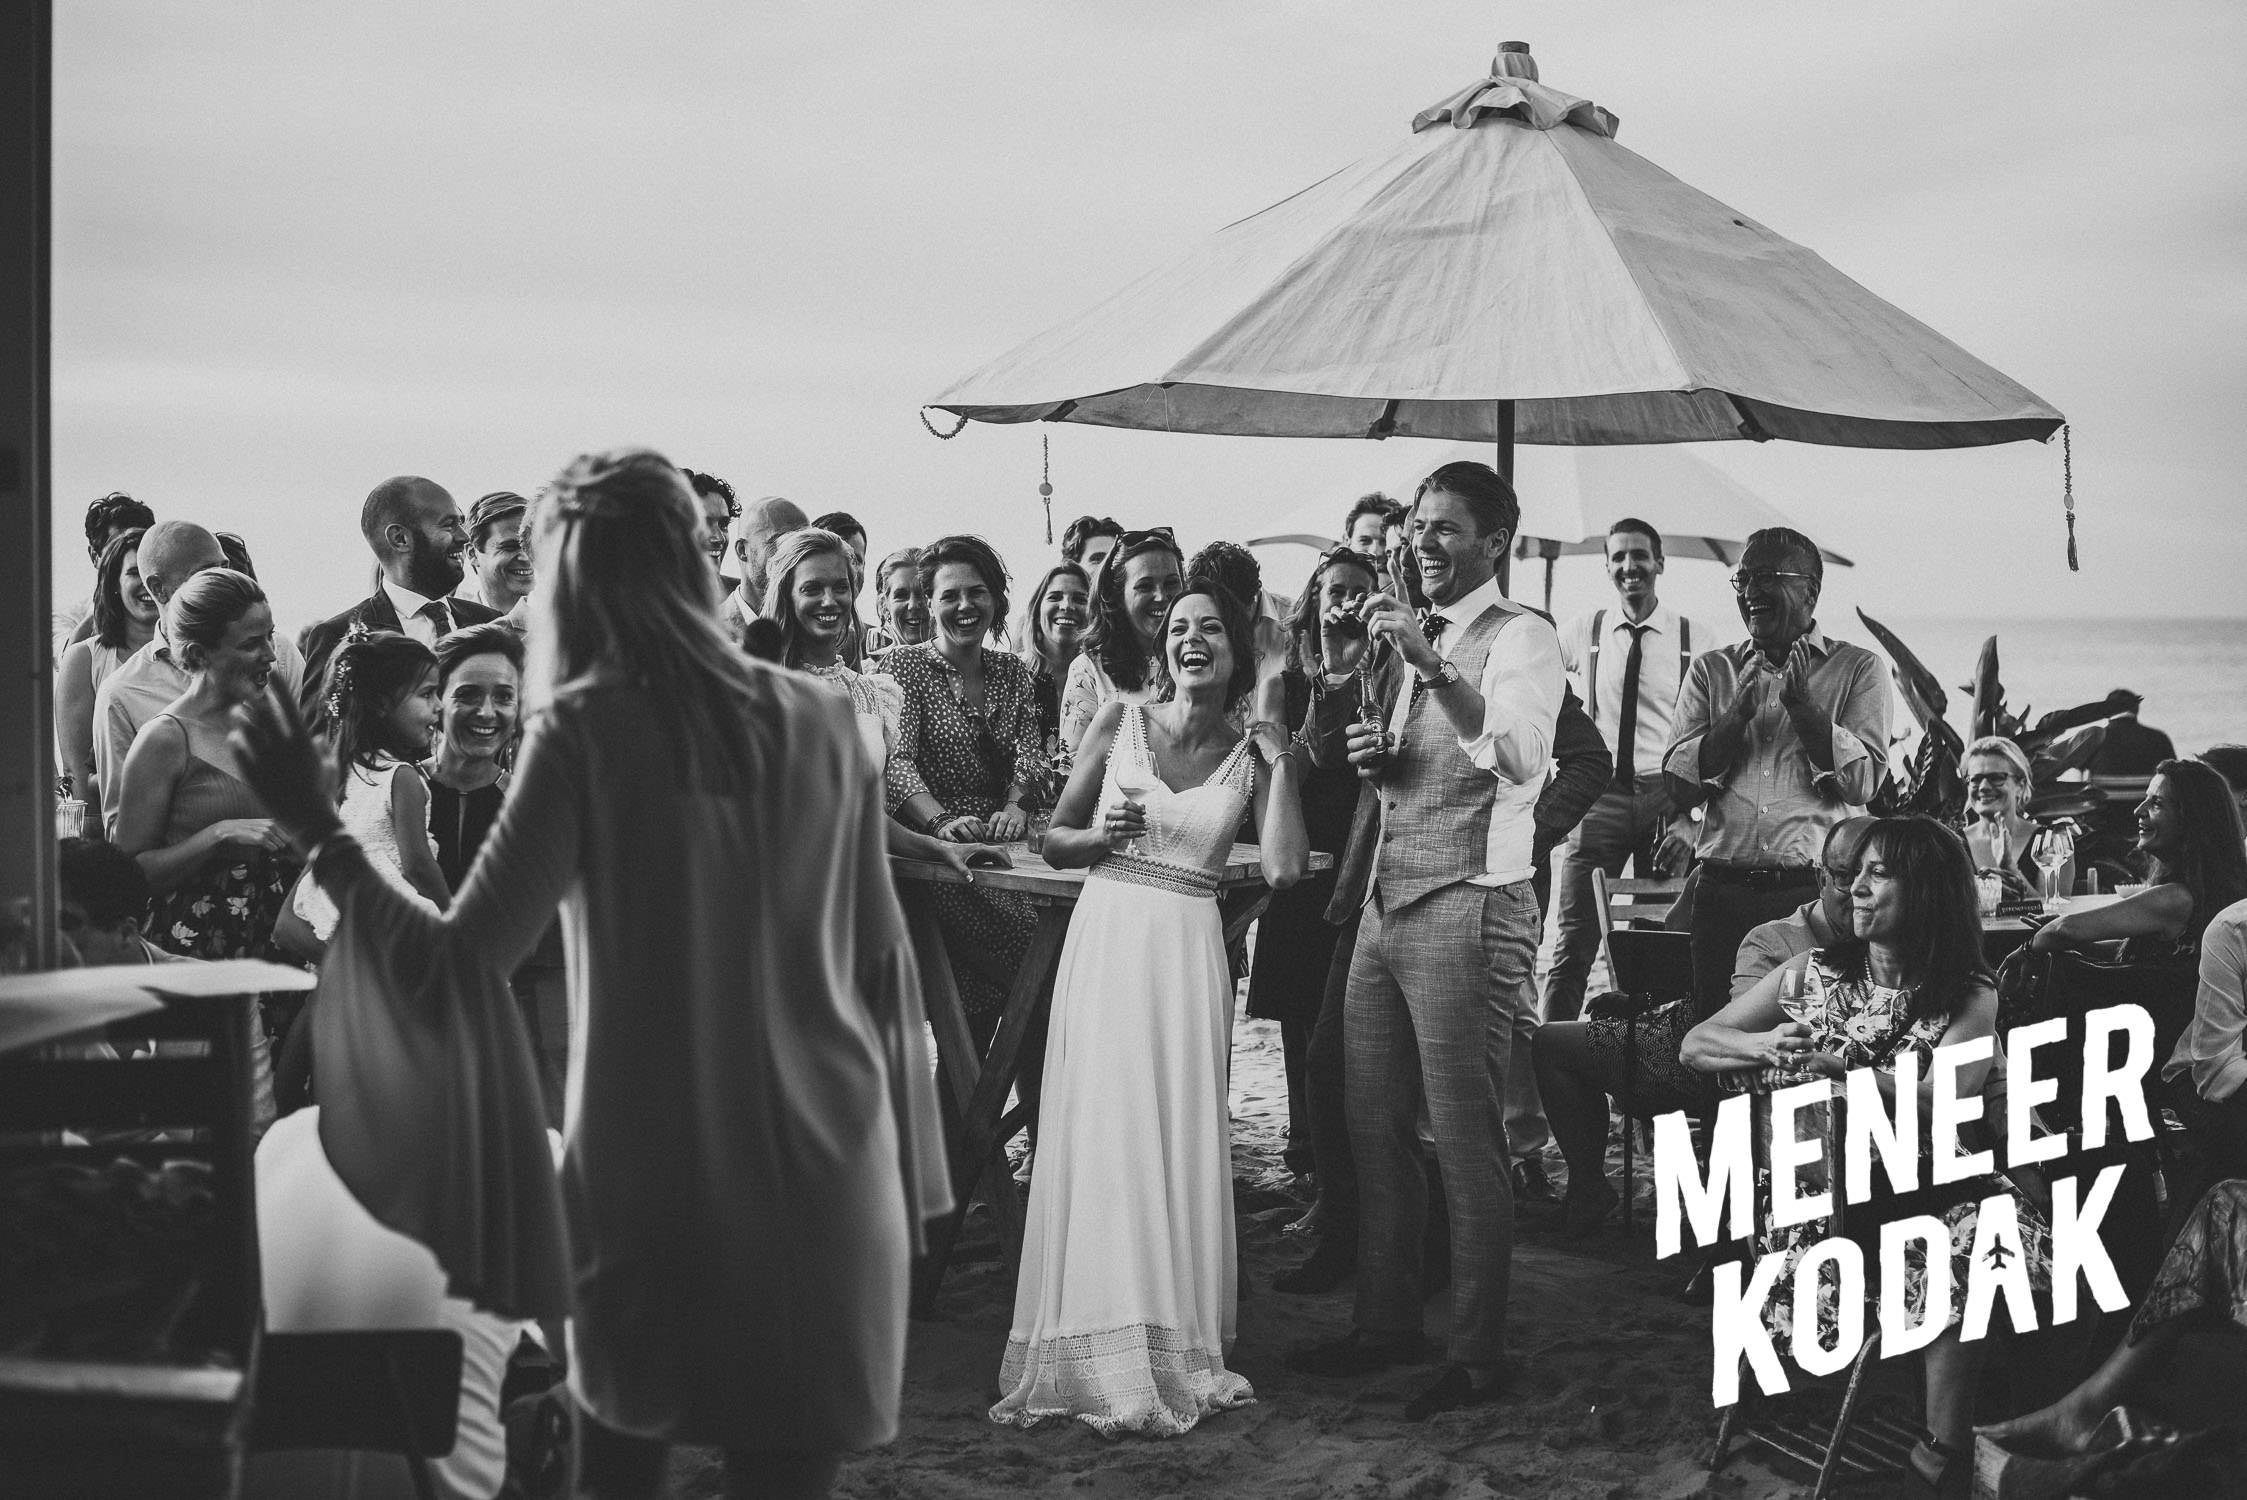 Meneer Kodak - Strandbruiloft - Noordwijk - K&A-118.jpg